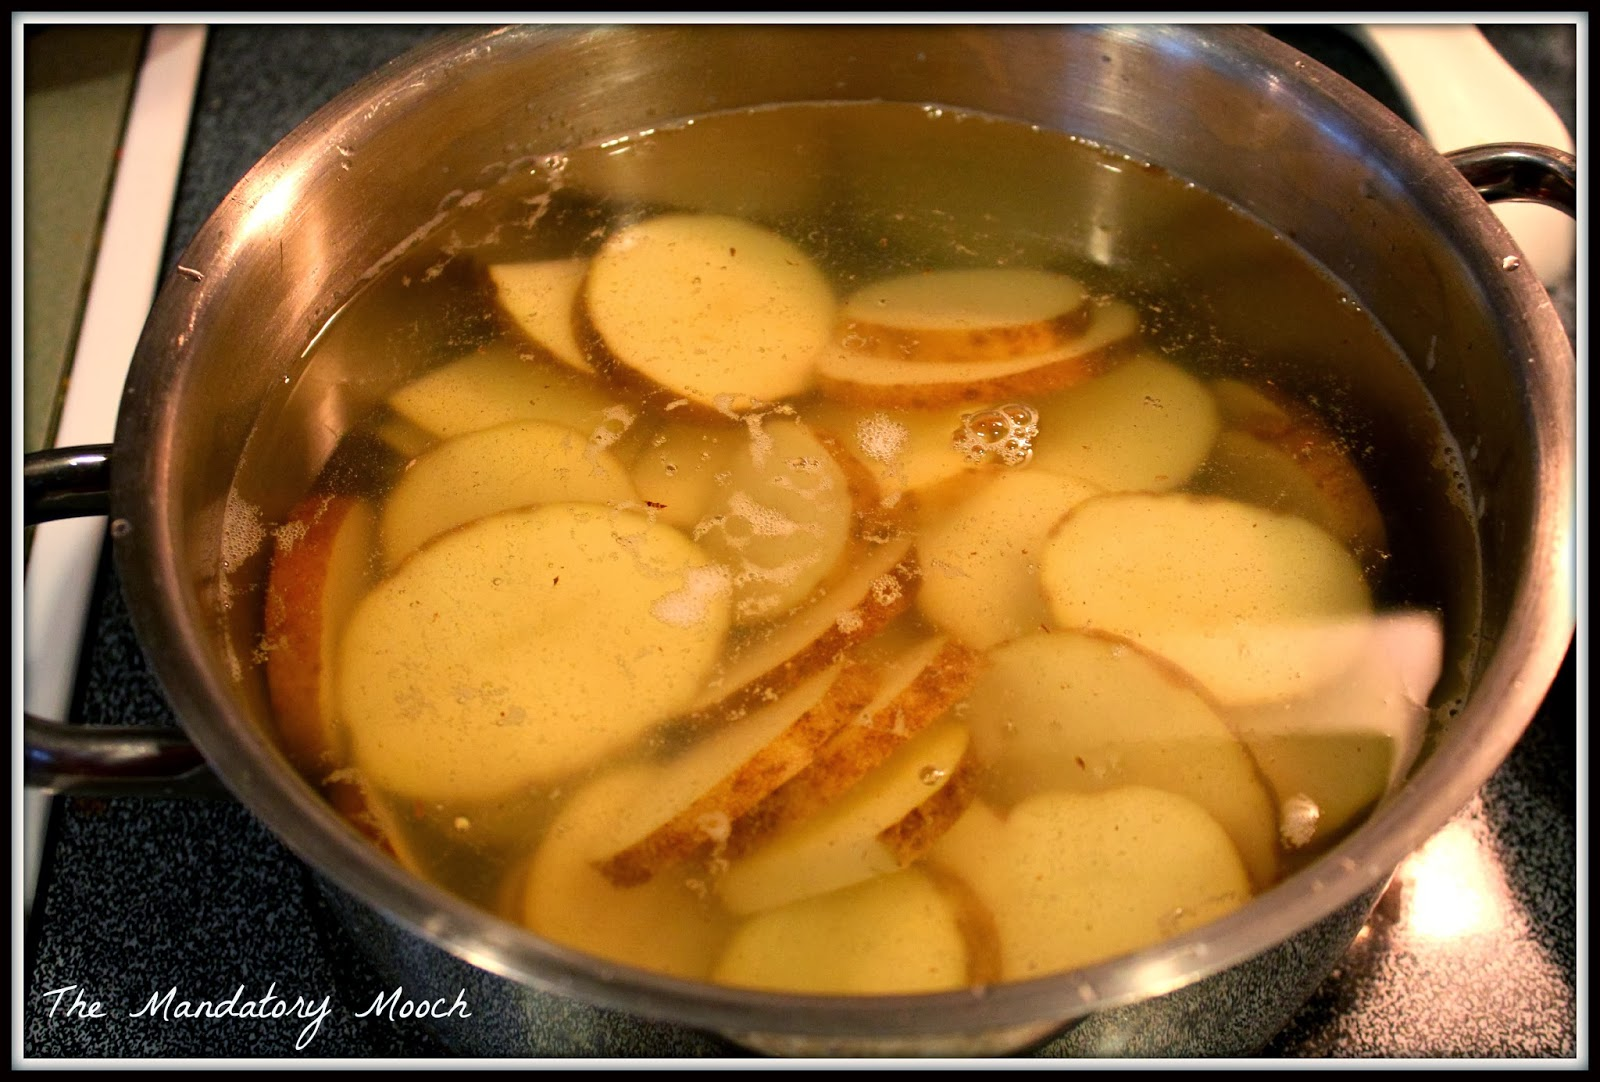 The Mandatory Mooch: Loaded Baked Potato Slices